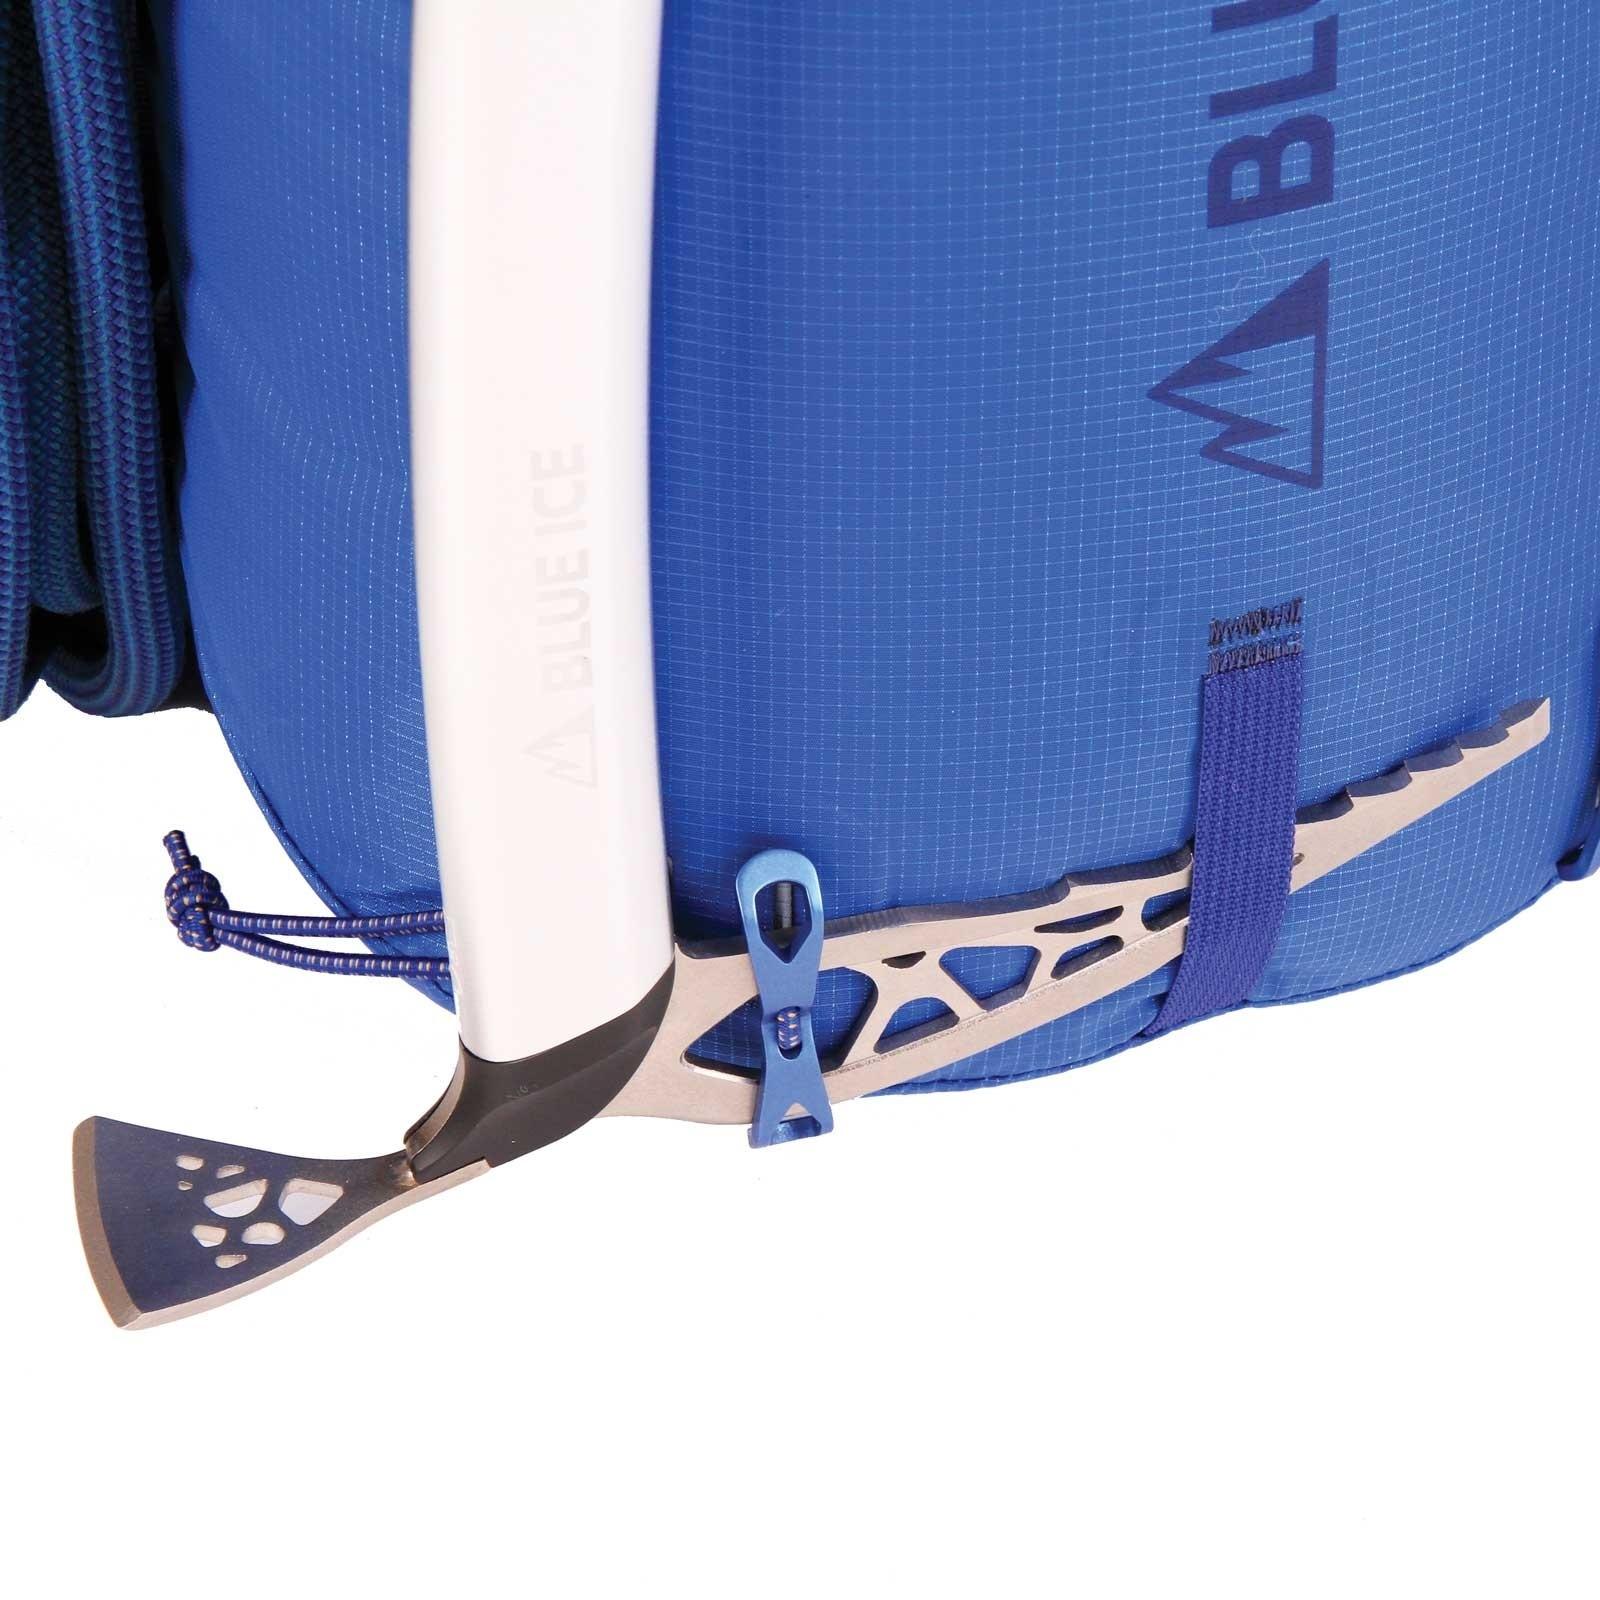 Blue Ice Dragonfly 18L Rucksack - Turkish Blue